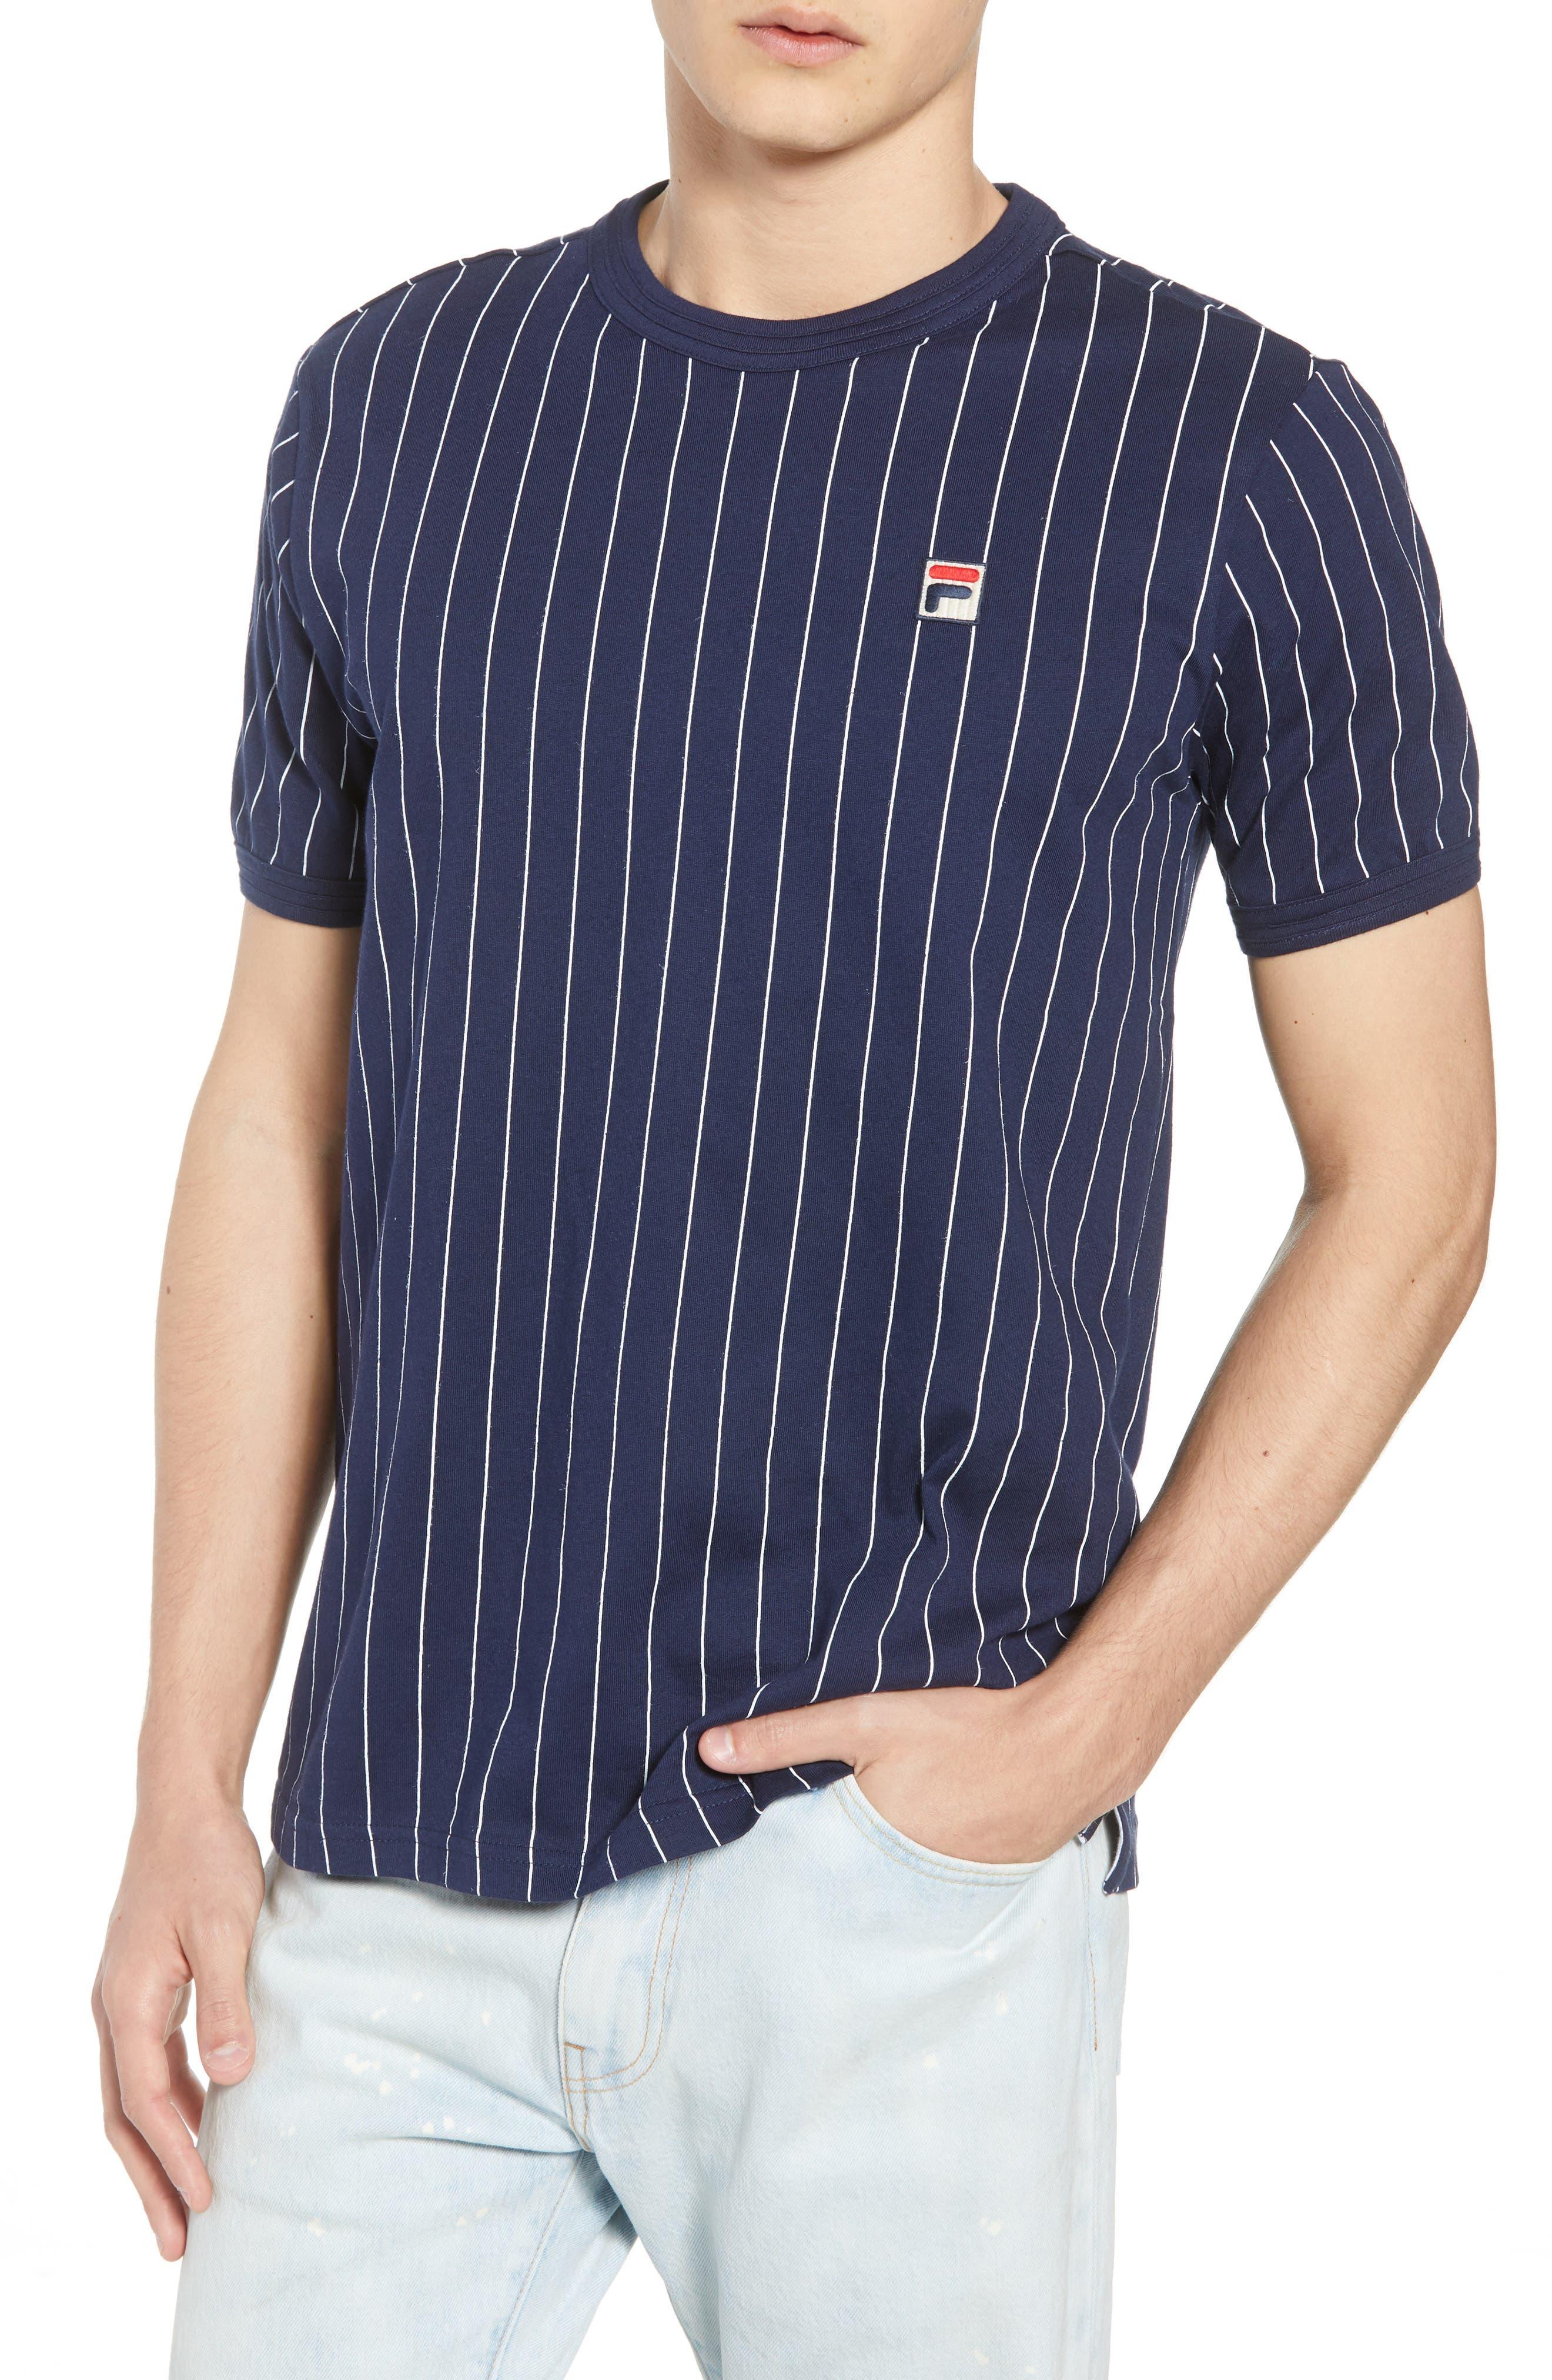 Guilo T-Shirt,                             Main thumbnail 1, color,                             PEACOAT/ WHITE